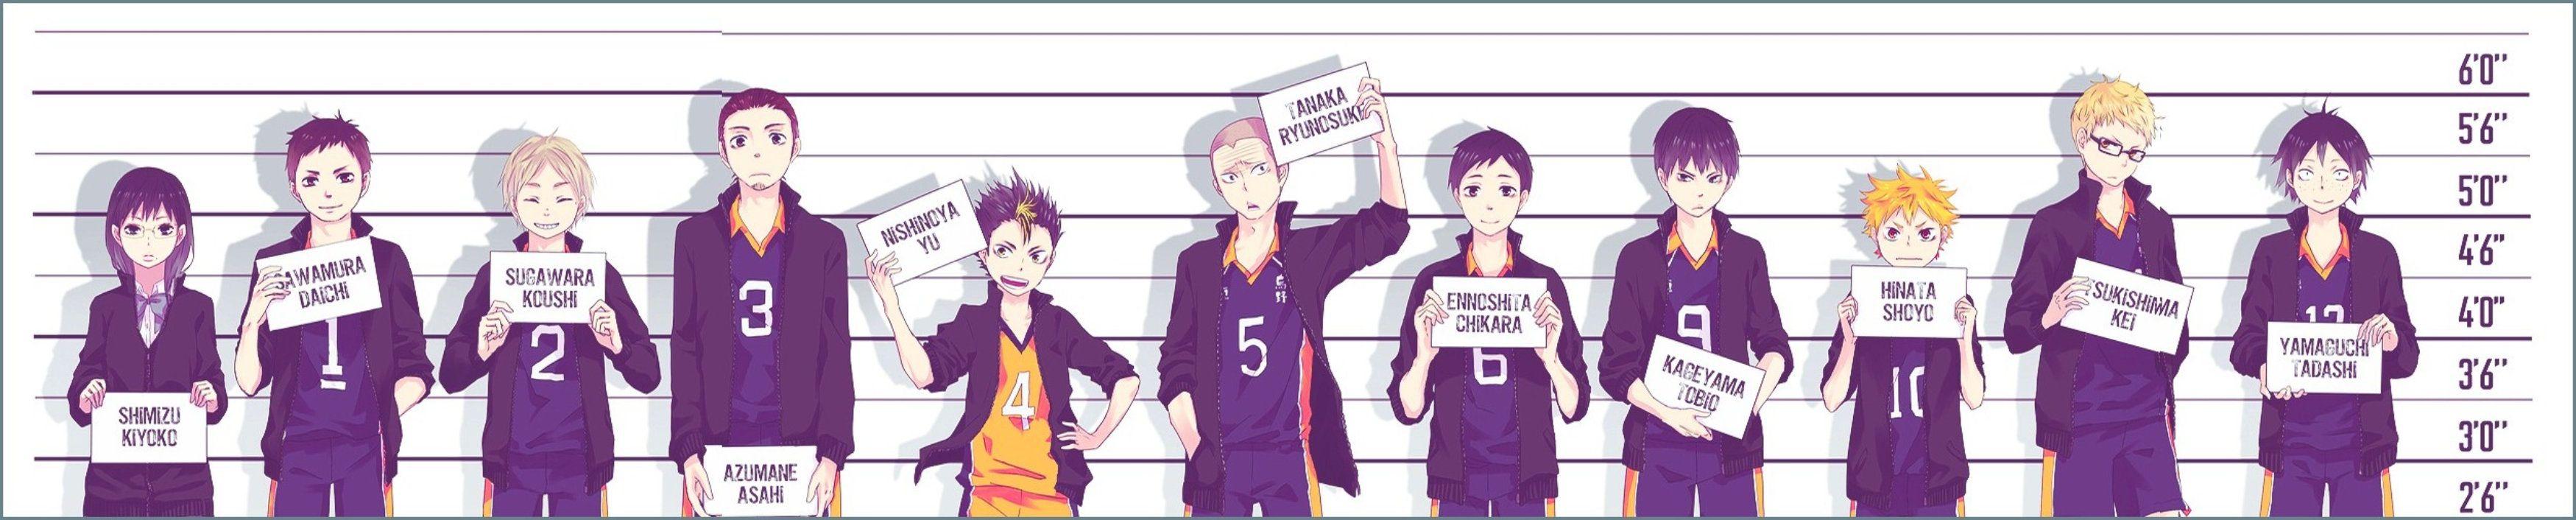 Haikyuu Karasuno Volleyball Team Haikyuu Haikyuu Season 2 Karasuno